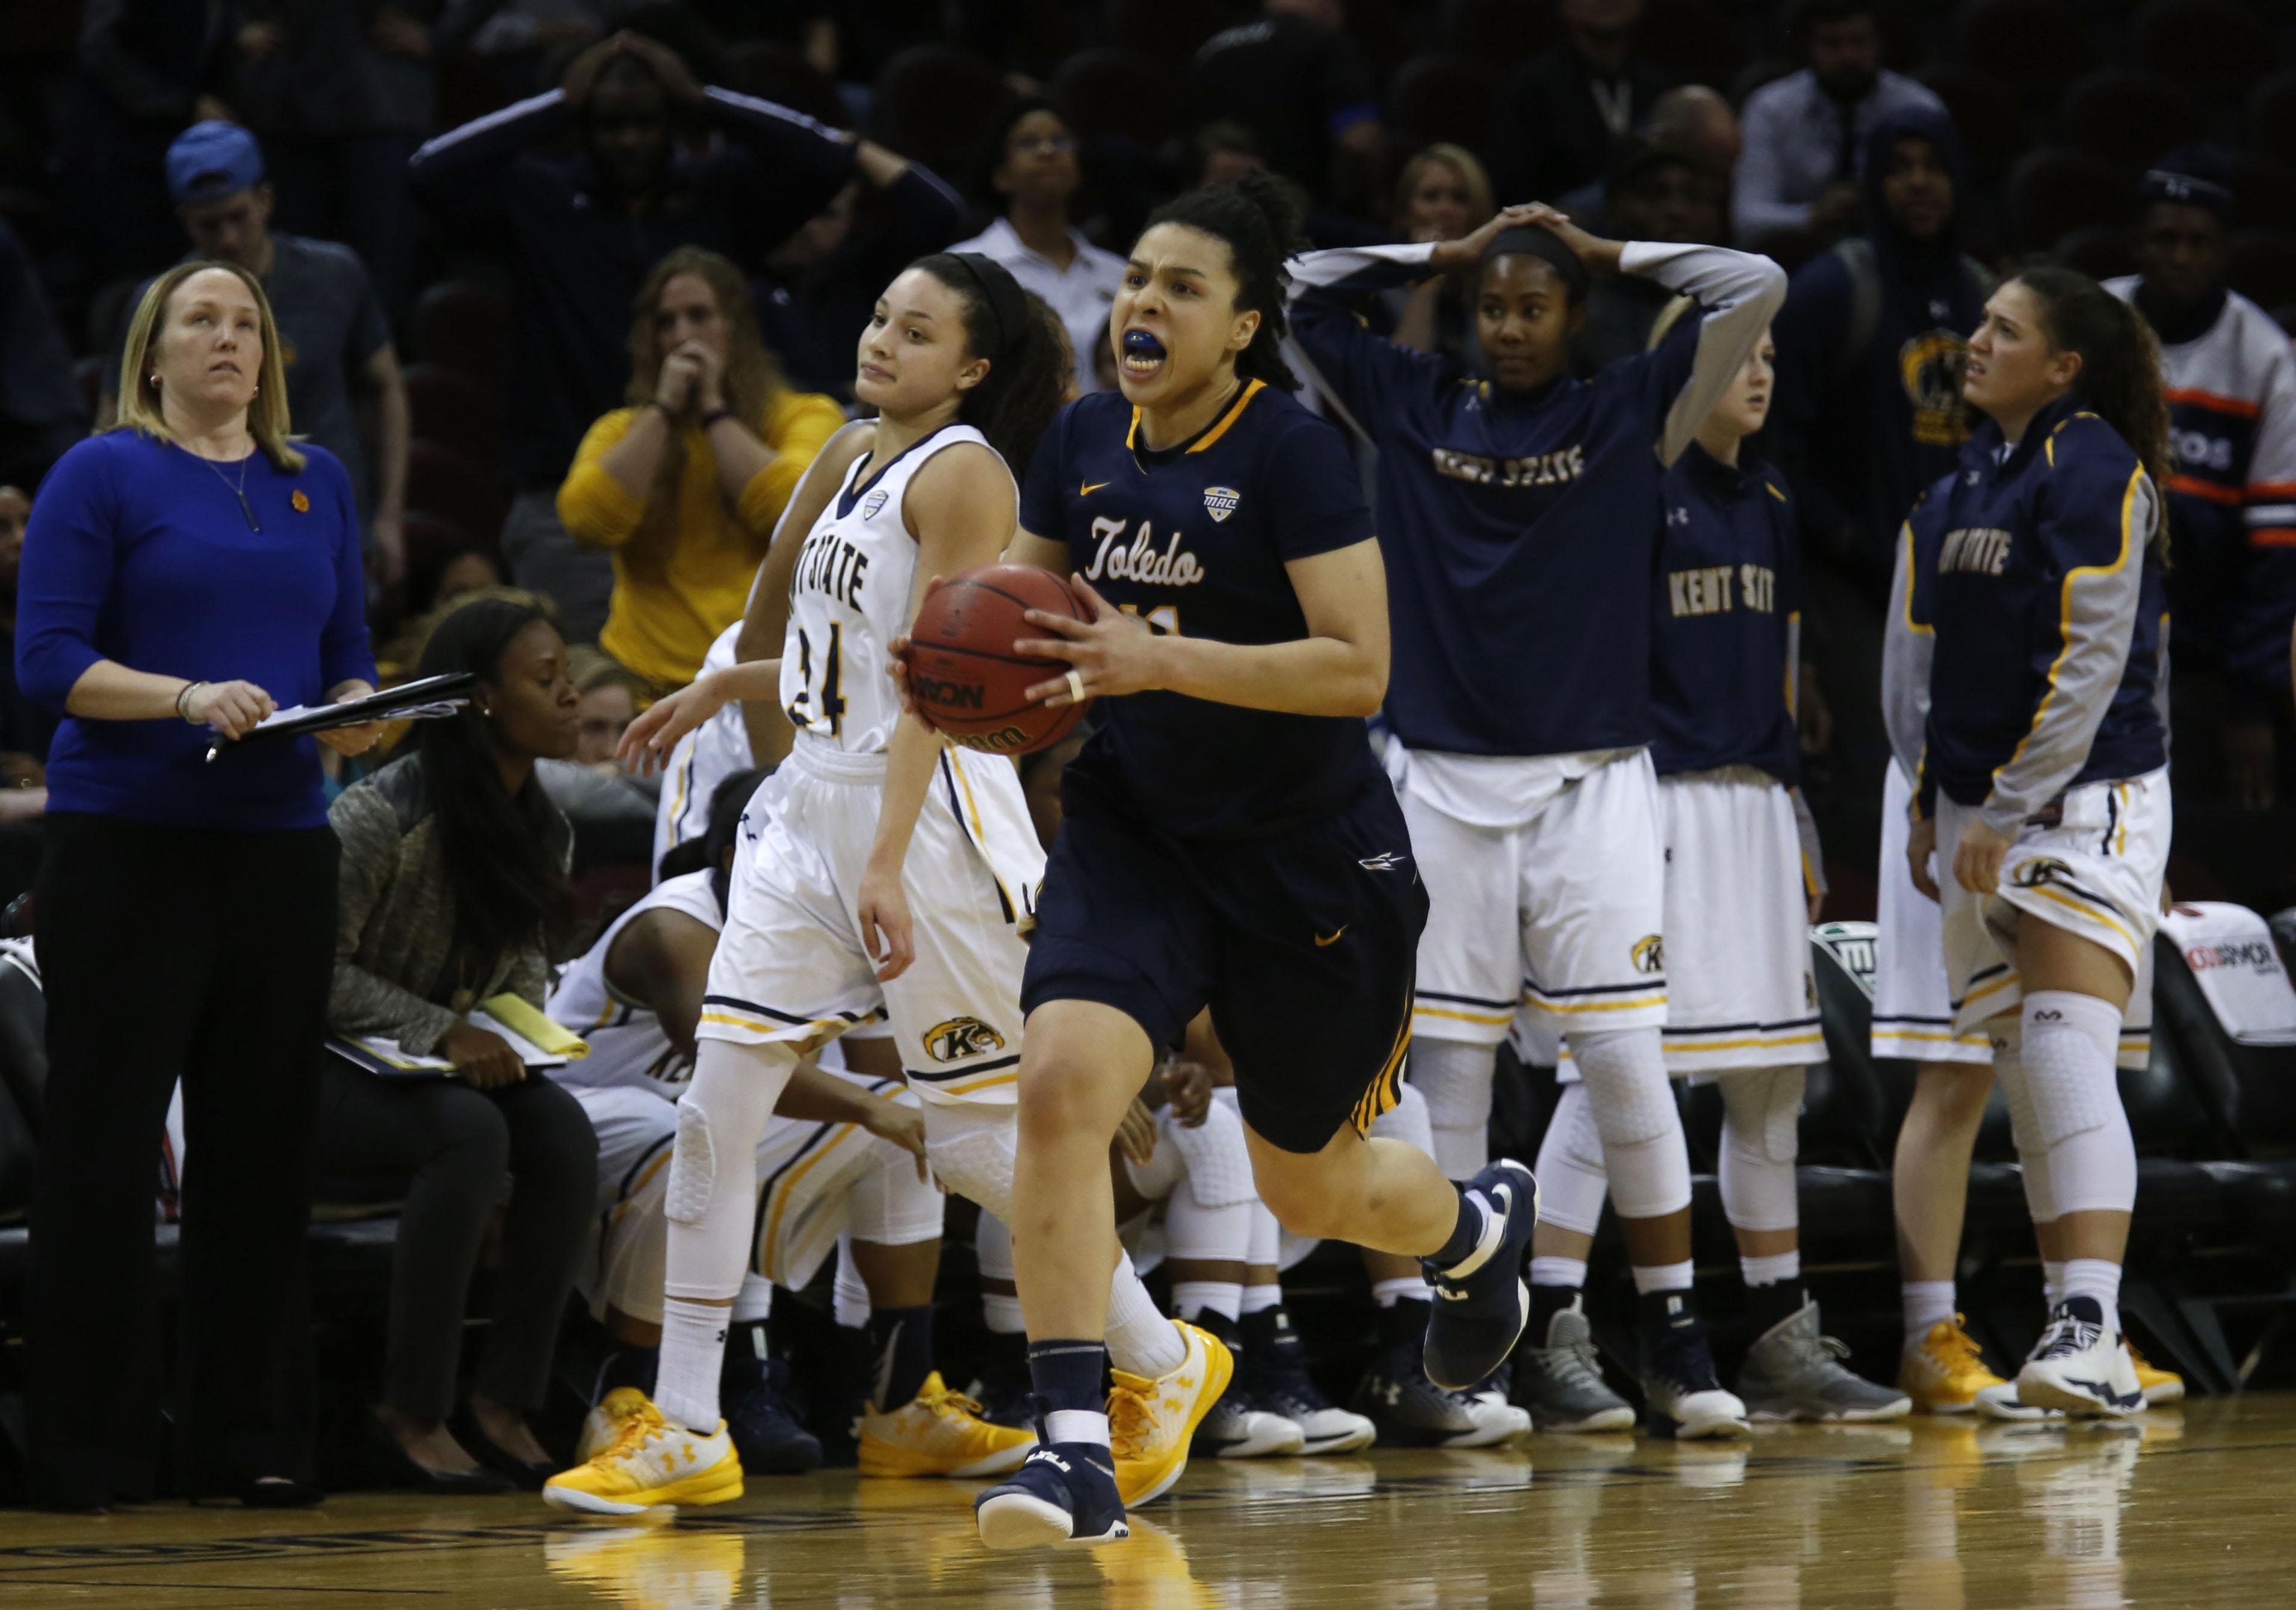 Dylan Frye Basketball | Basketball Scores